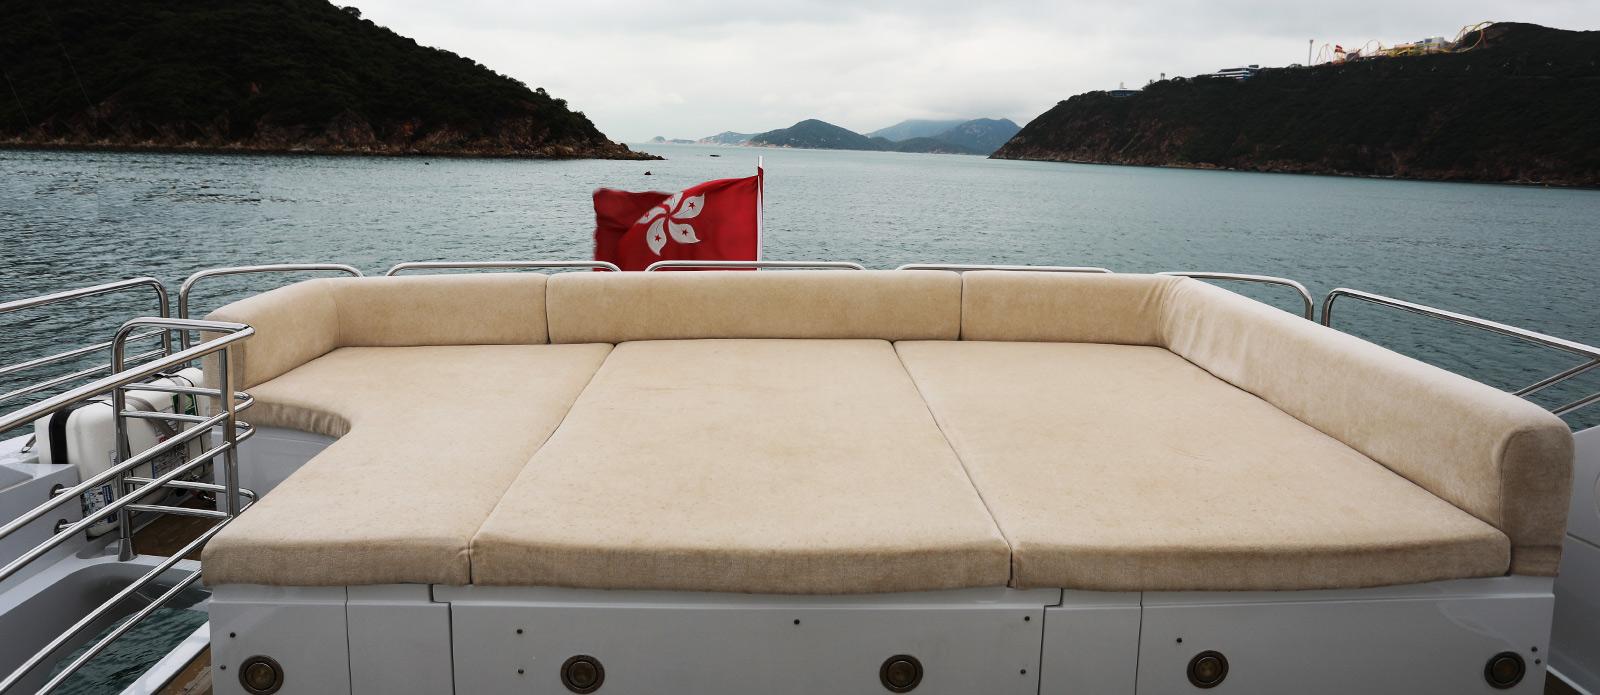 Sunseeker-30-Metre-Yacht-Coraysa-Flybridge-Sunpad